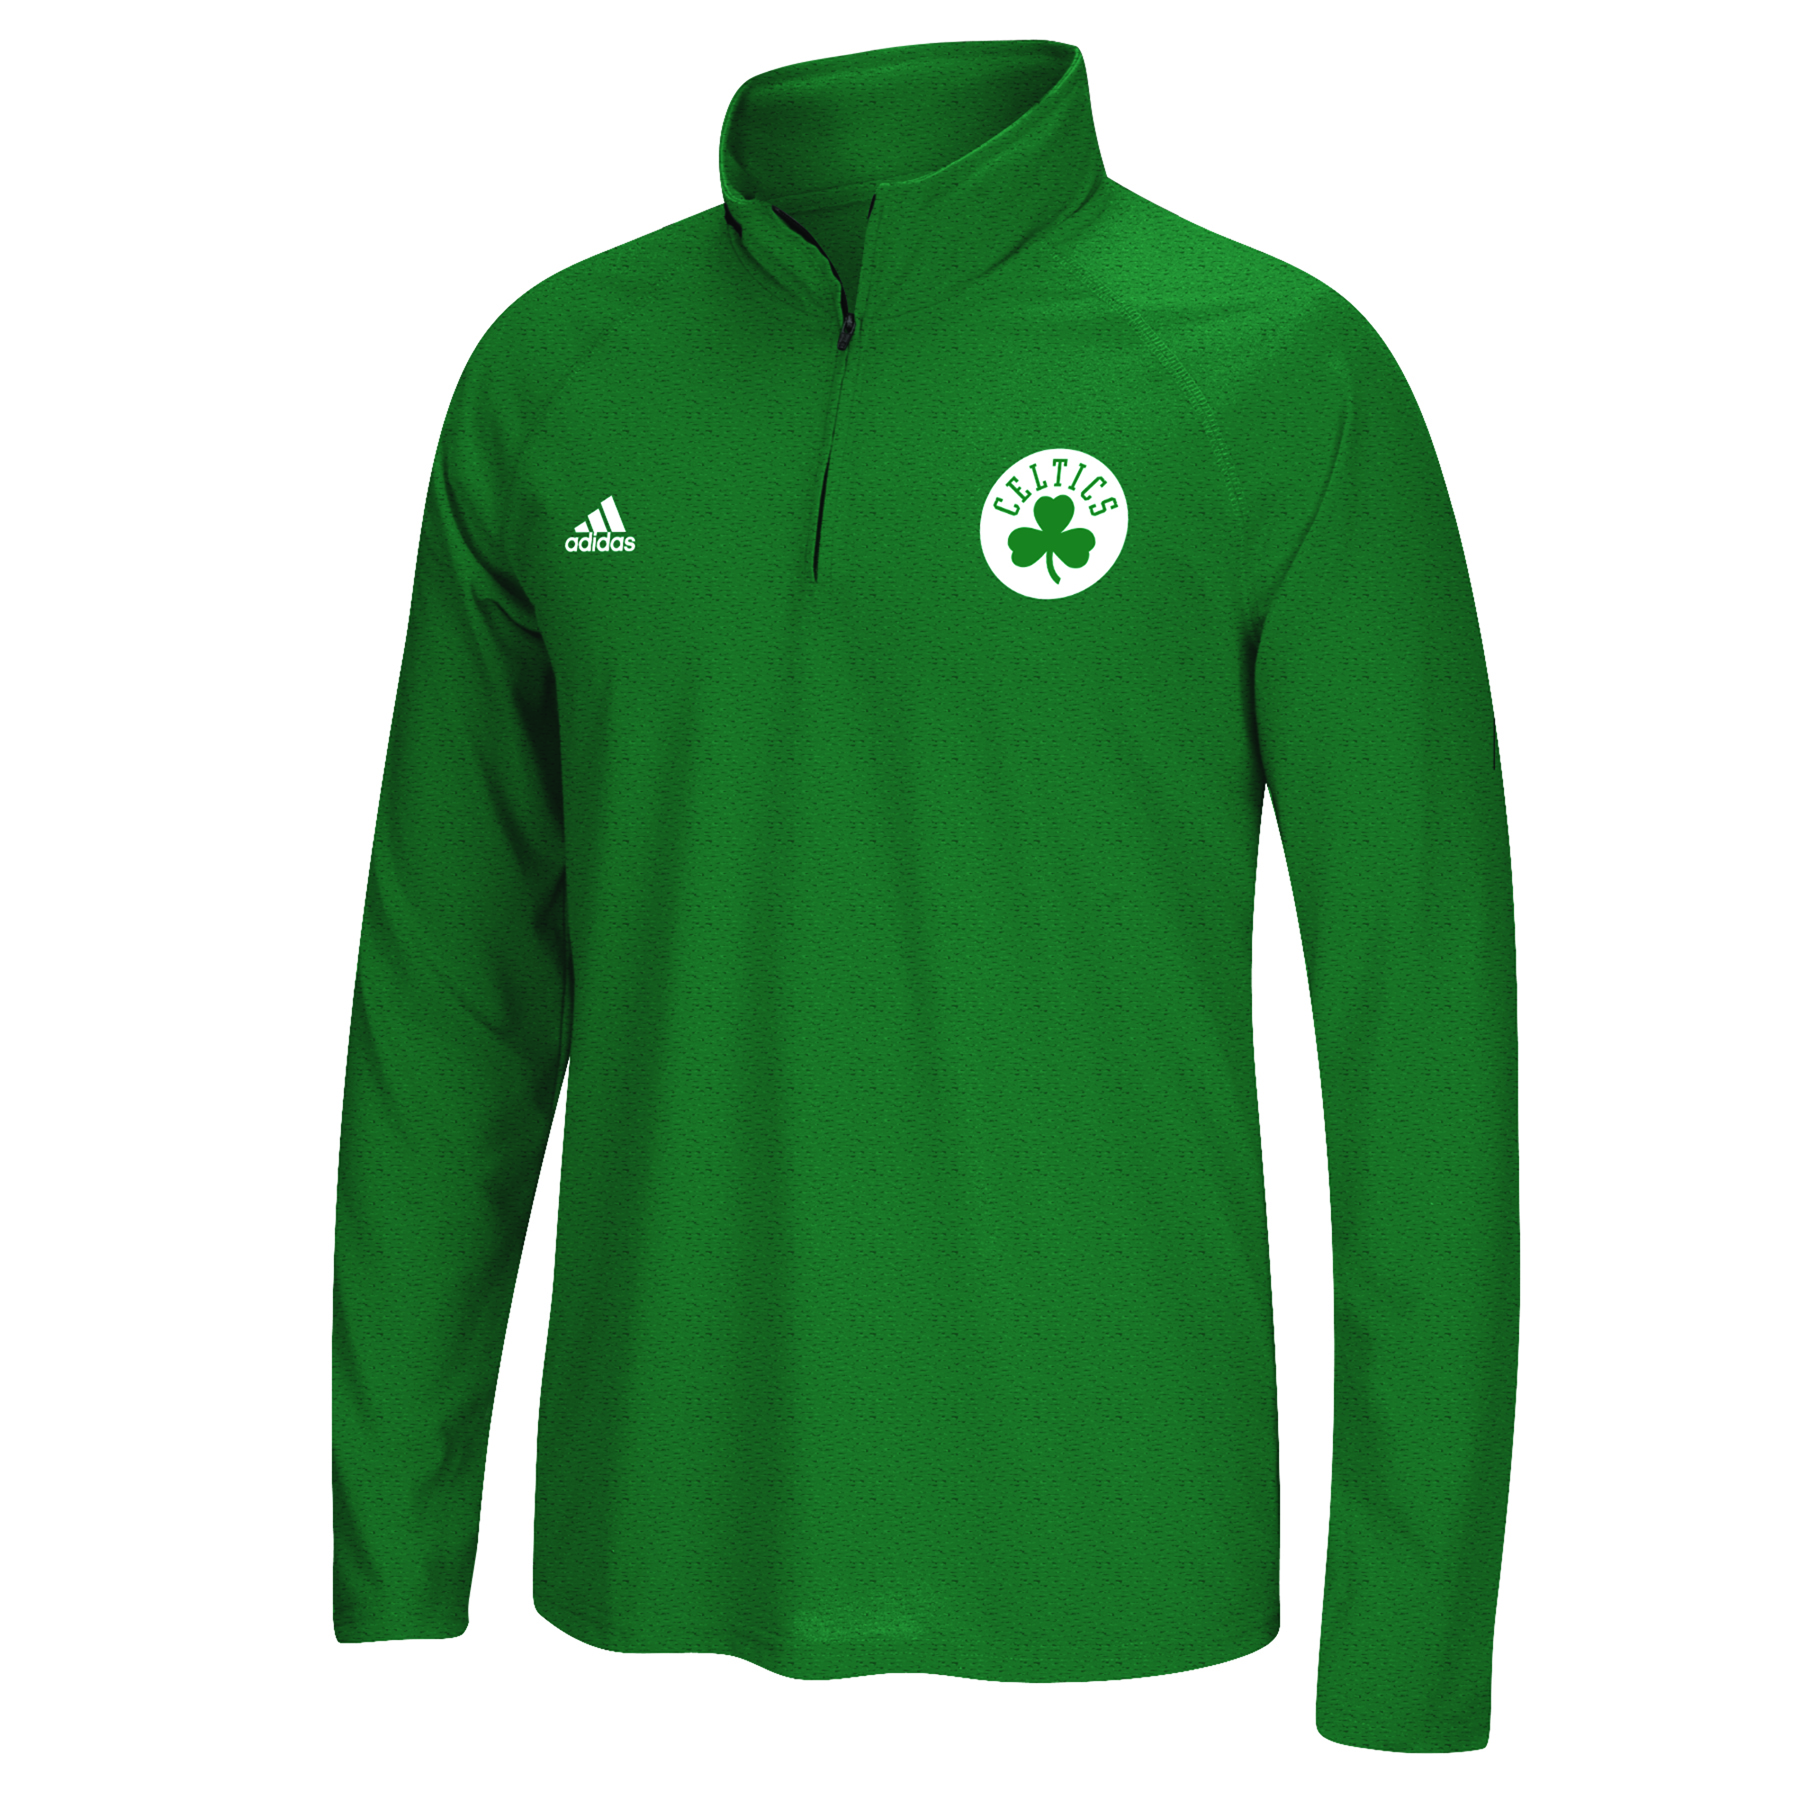 Boston Celtics adidas Climalite 1/4 Zip Top - Mens